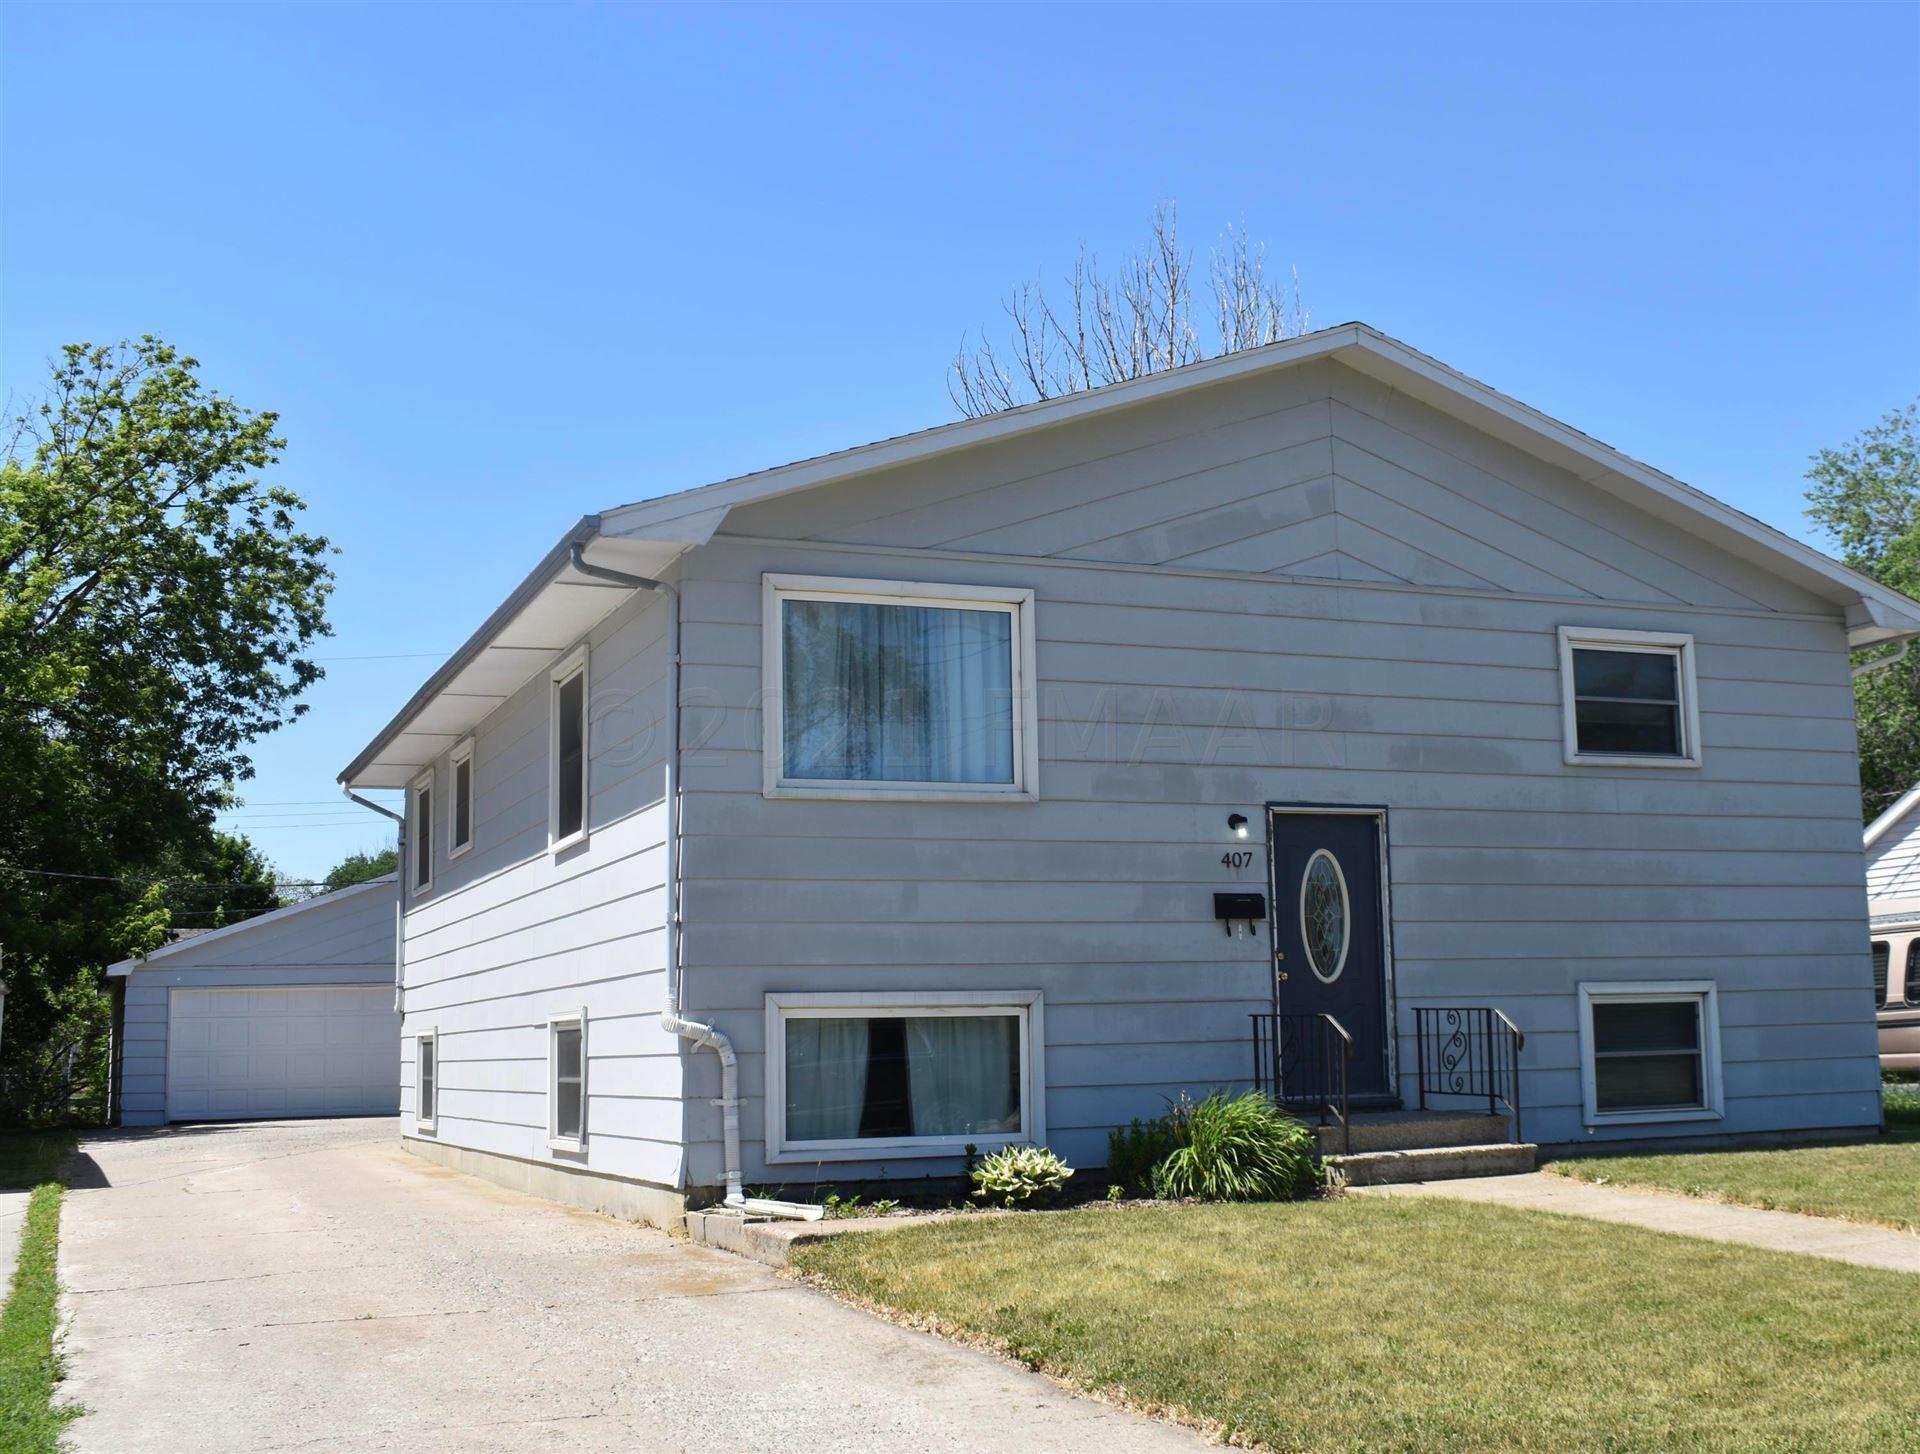 407 21 Street S, Fargo, ND 58103 - #: 21-3086